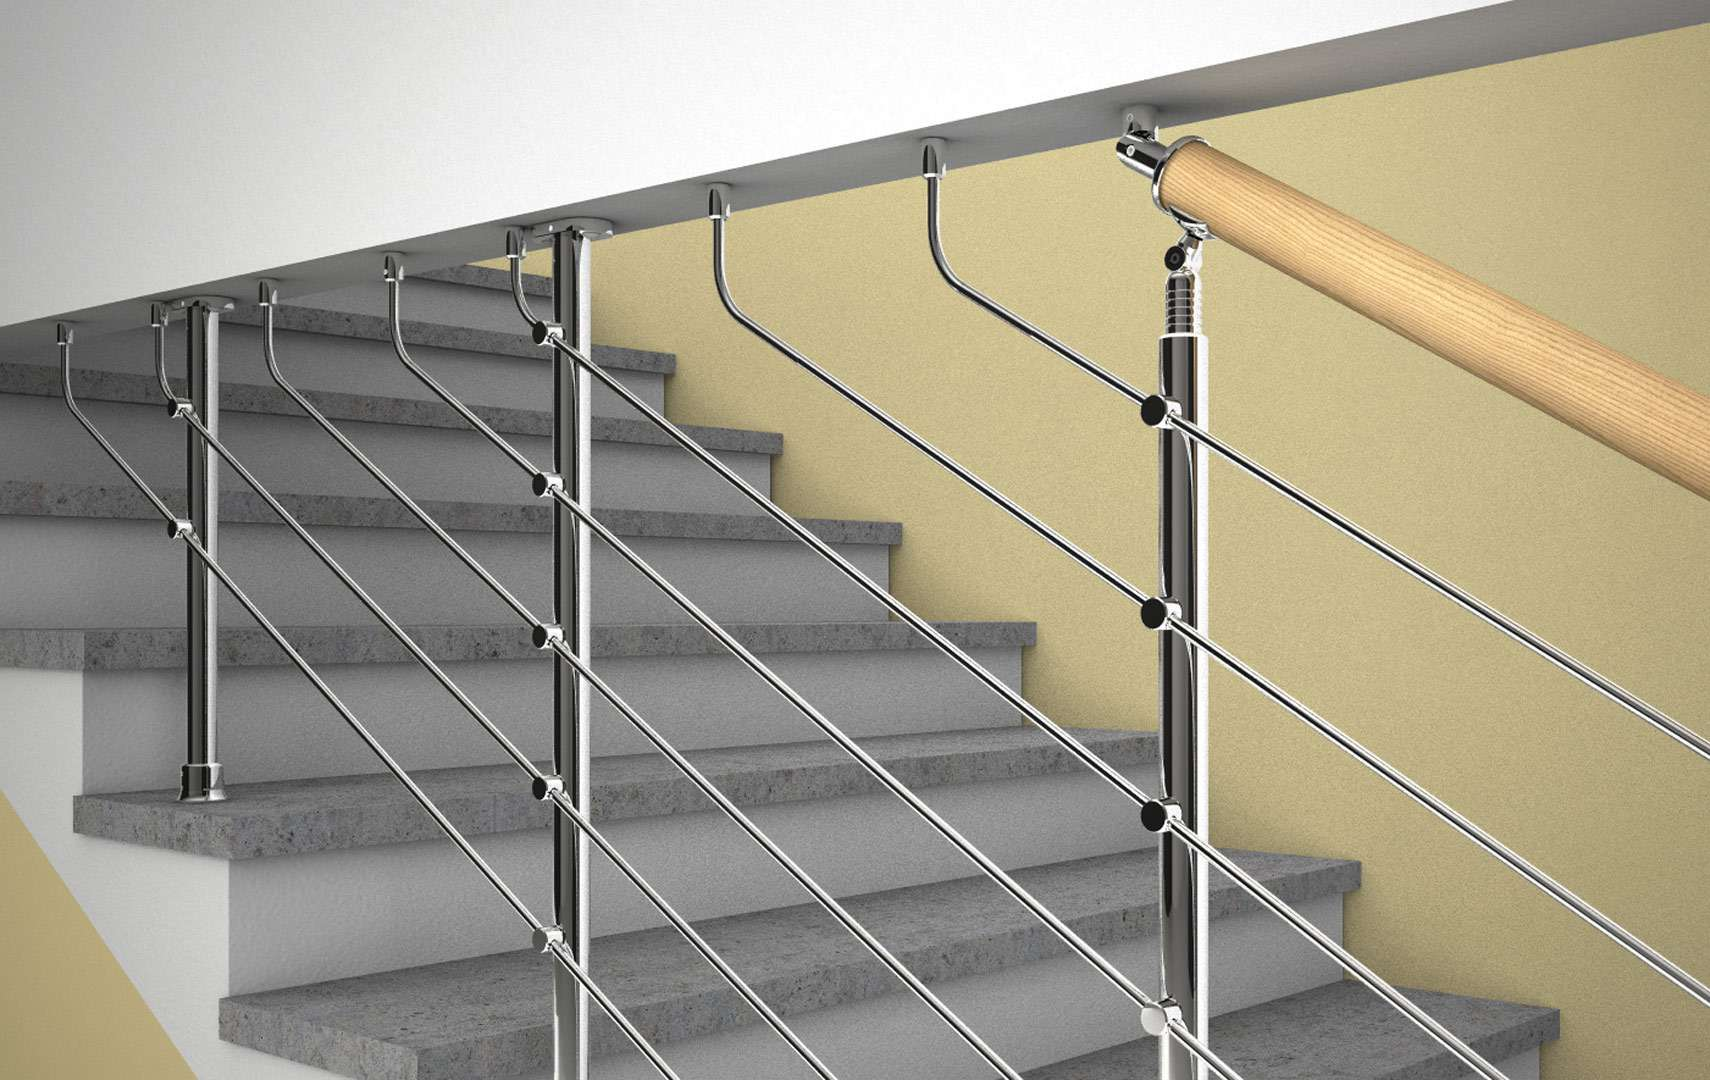 Parapetti Per Scale Interne ᐅ chrome - chrome | ringhiere per scale interne: ringhiere